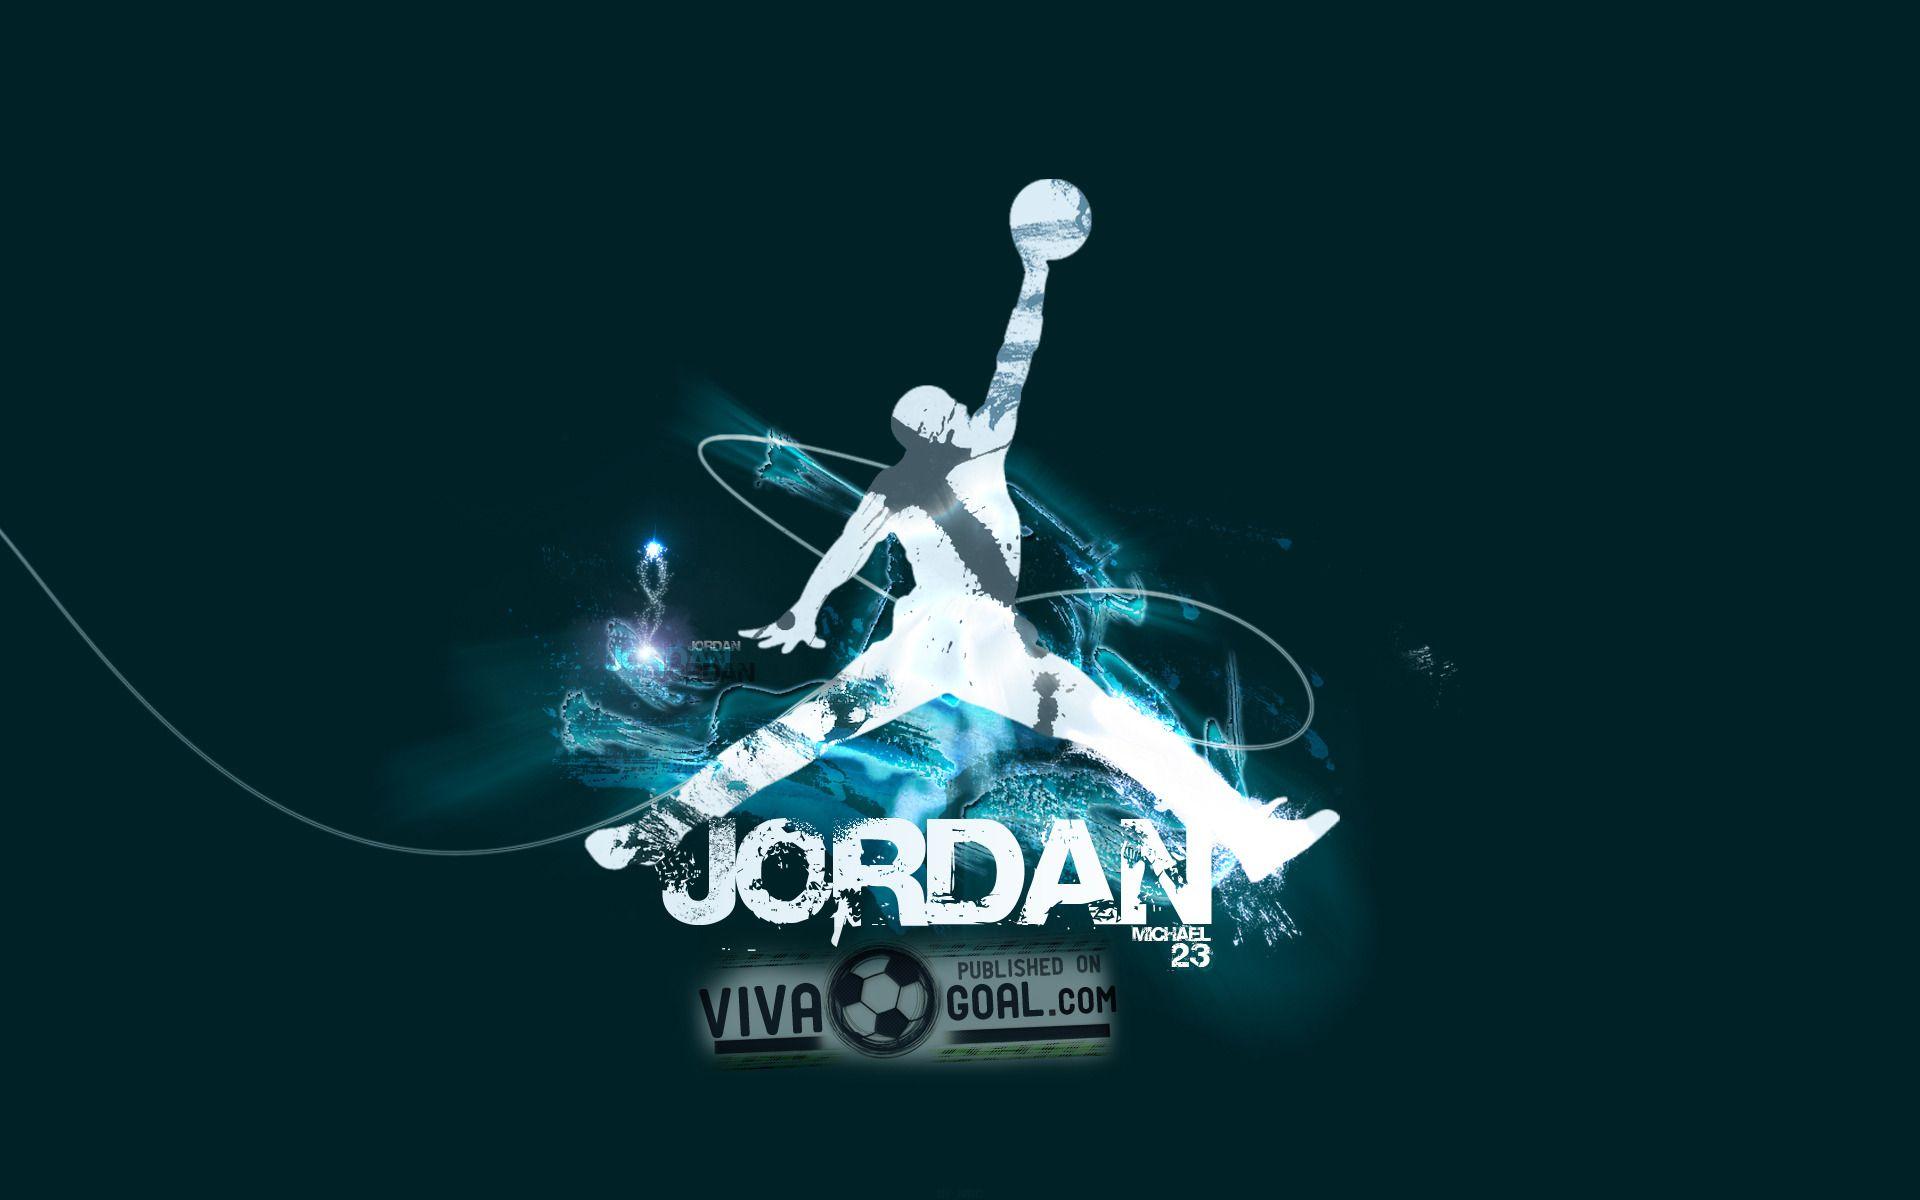 Jordan Logos Wallpapers Hd Images 3 Hd Wallpapers Hdwaly Com Olahraga